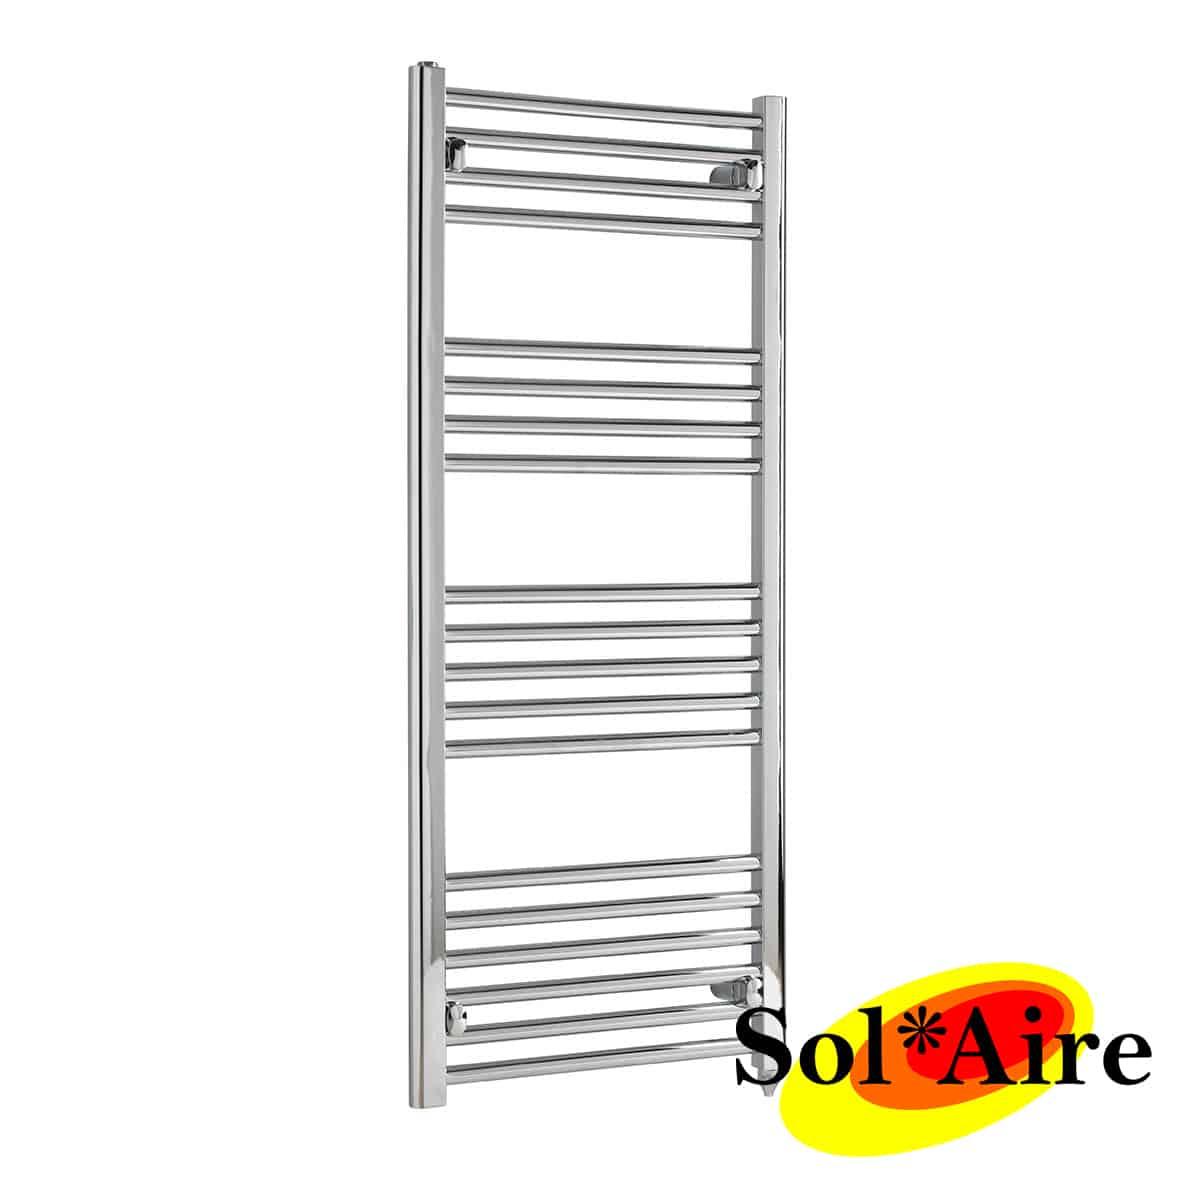 Rogerseller Fold Single 750 Heated Towel Rails: 600 X 1200 Chrome Electric Heated Towel Rail Rack Warmer